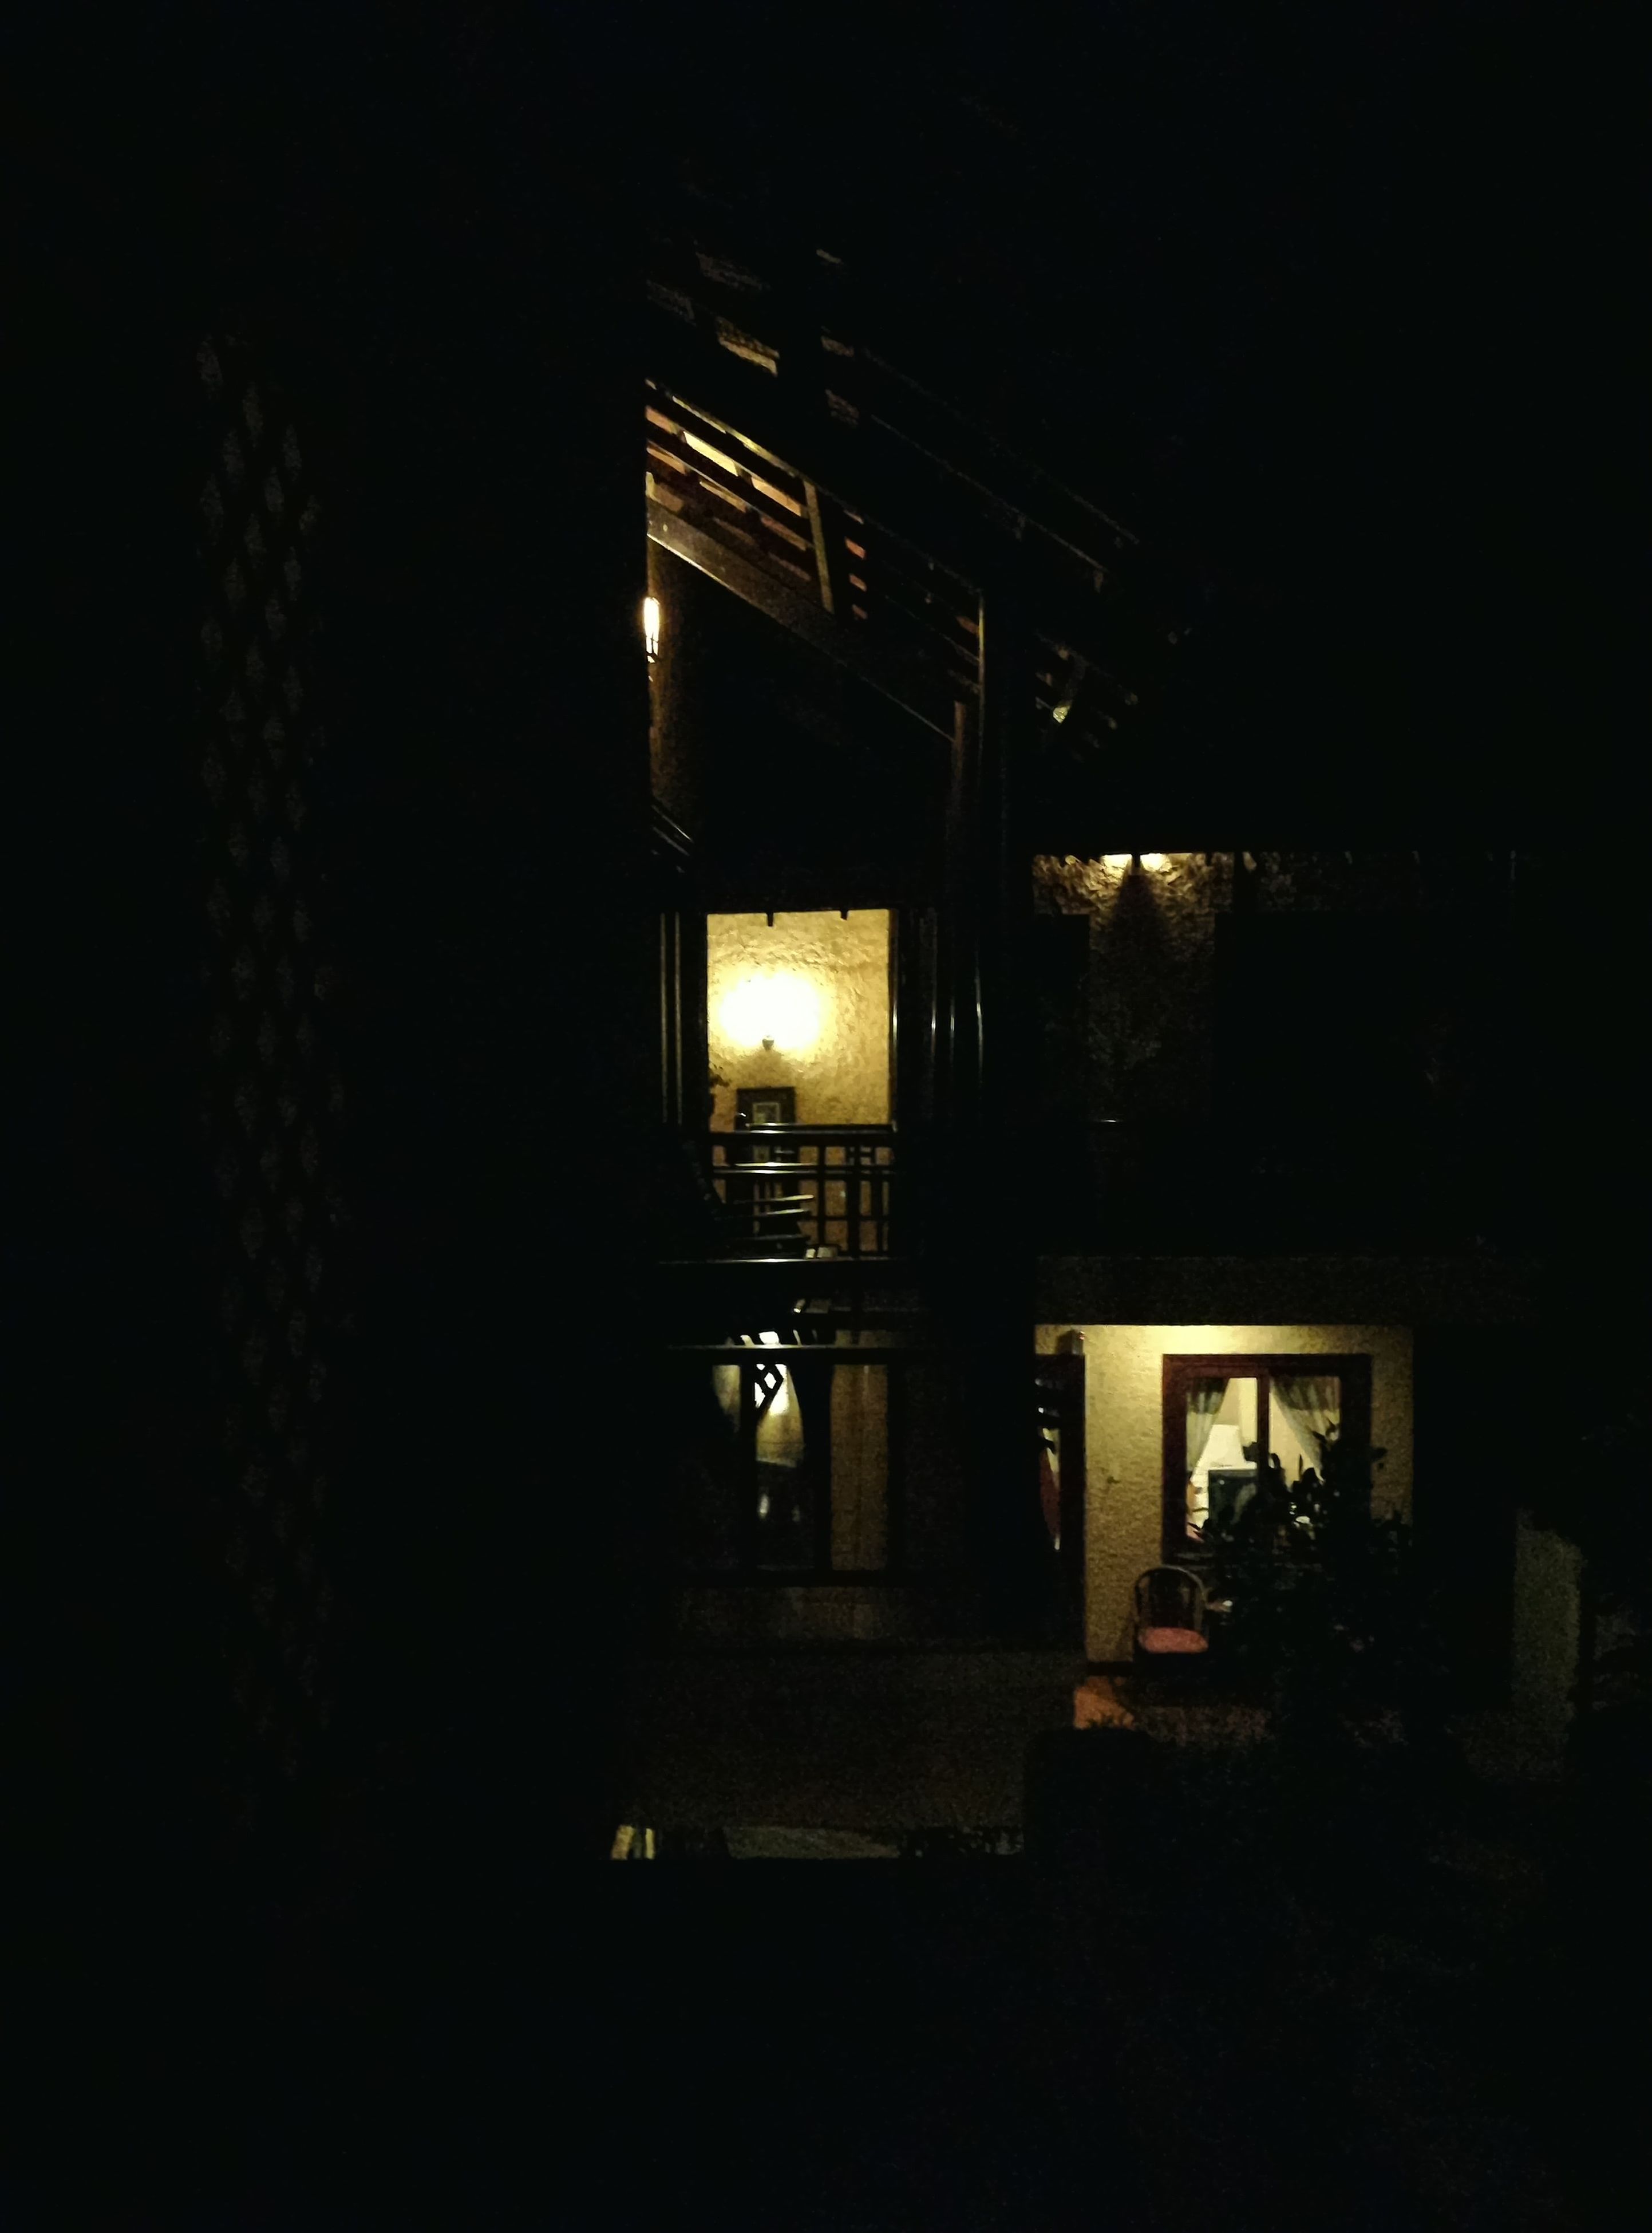 night, illuminated, dark, architecture, built structure, no people, indoors, building exterior